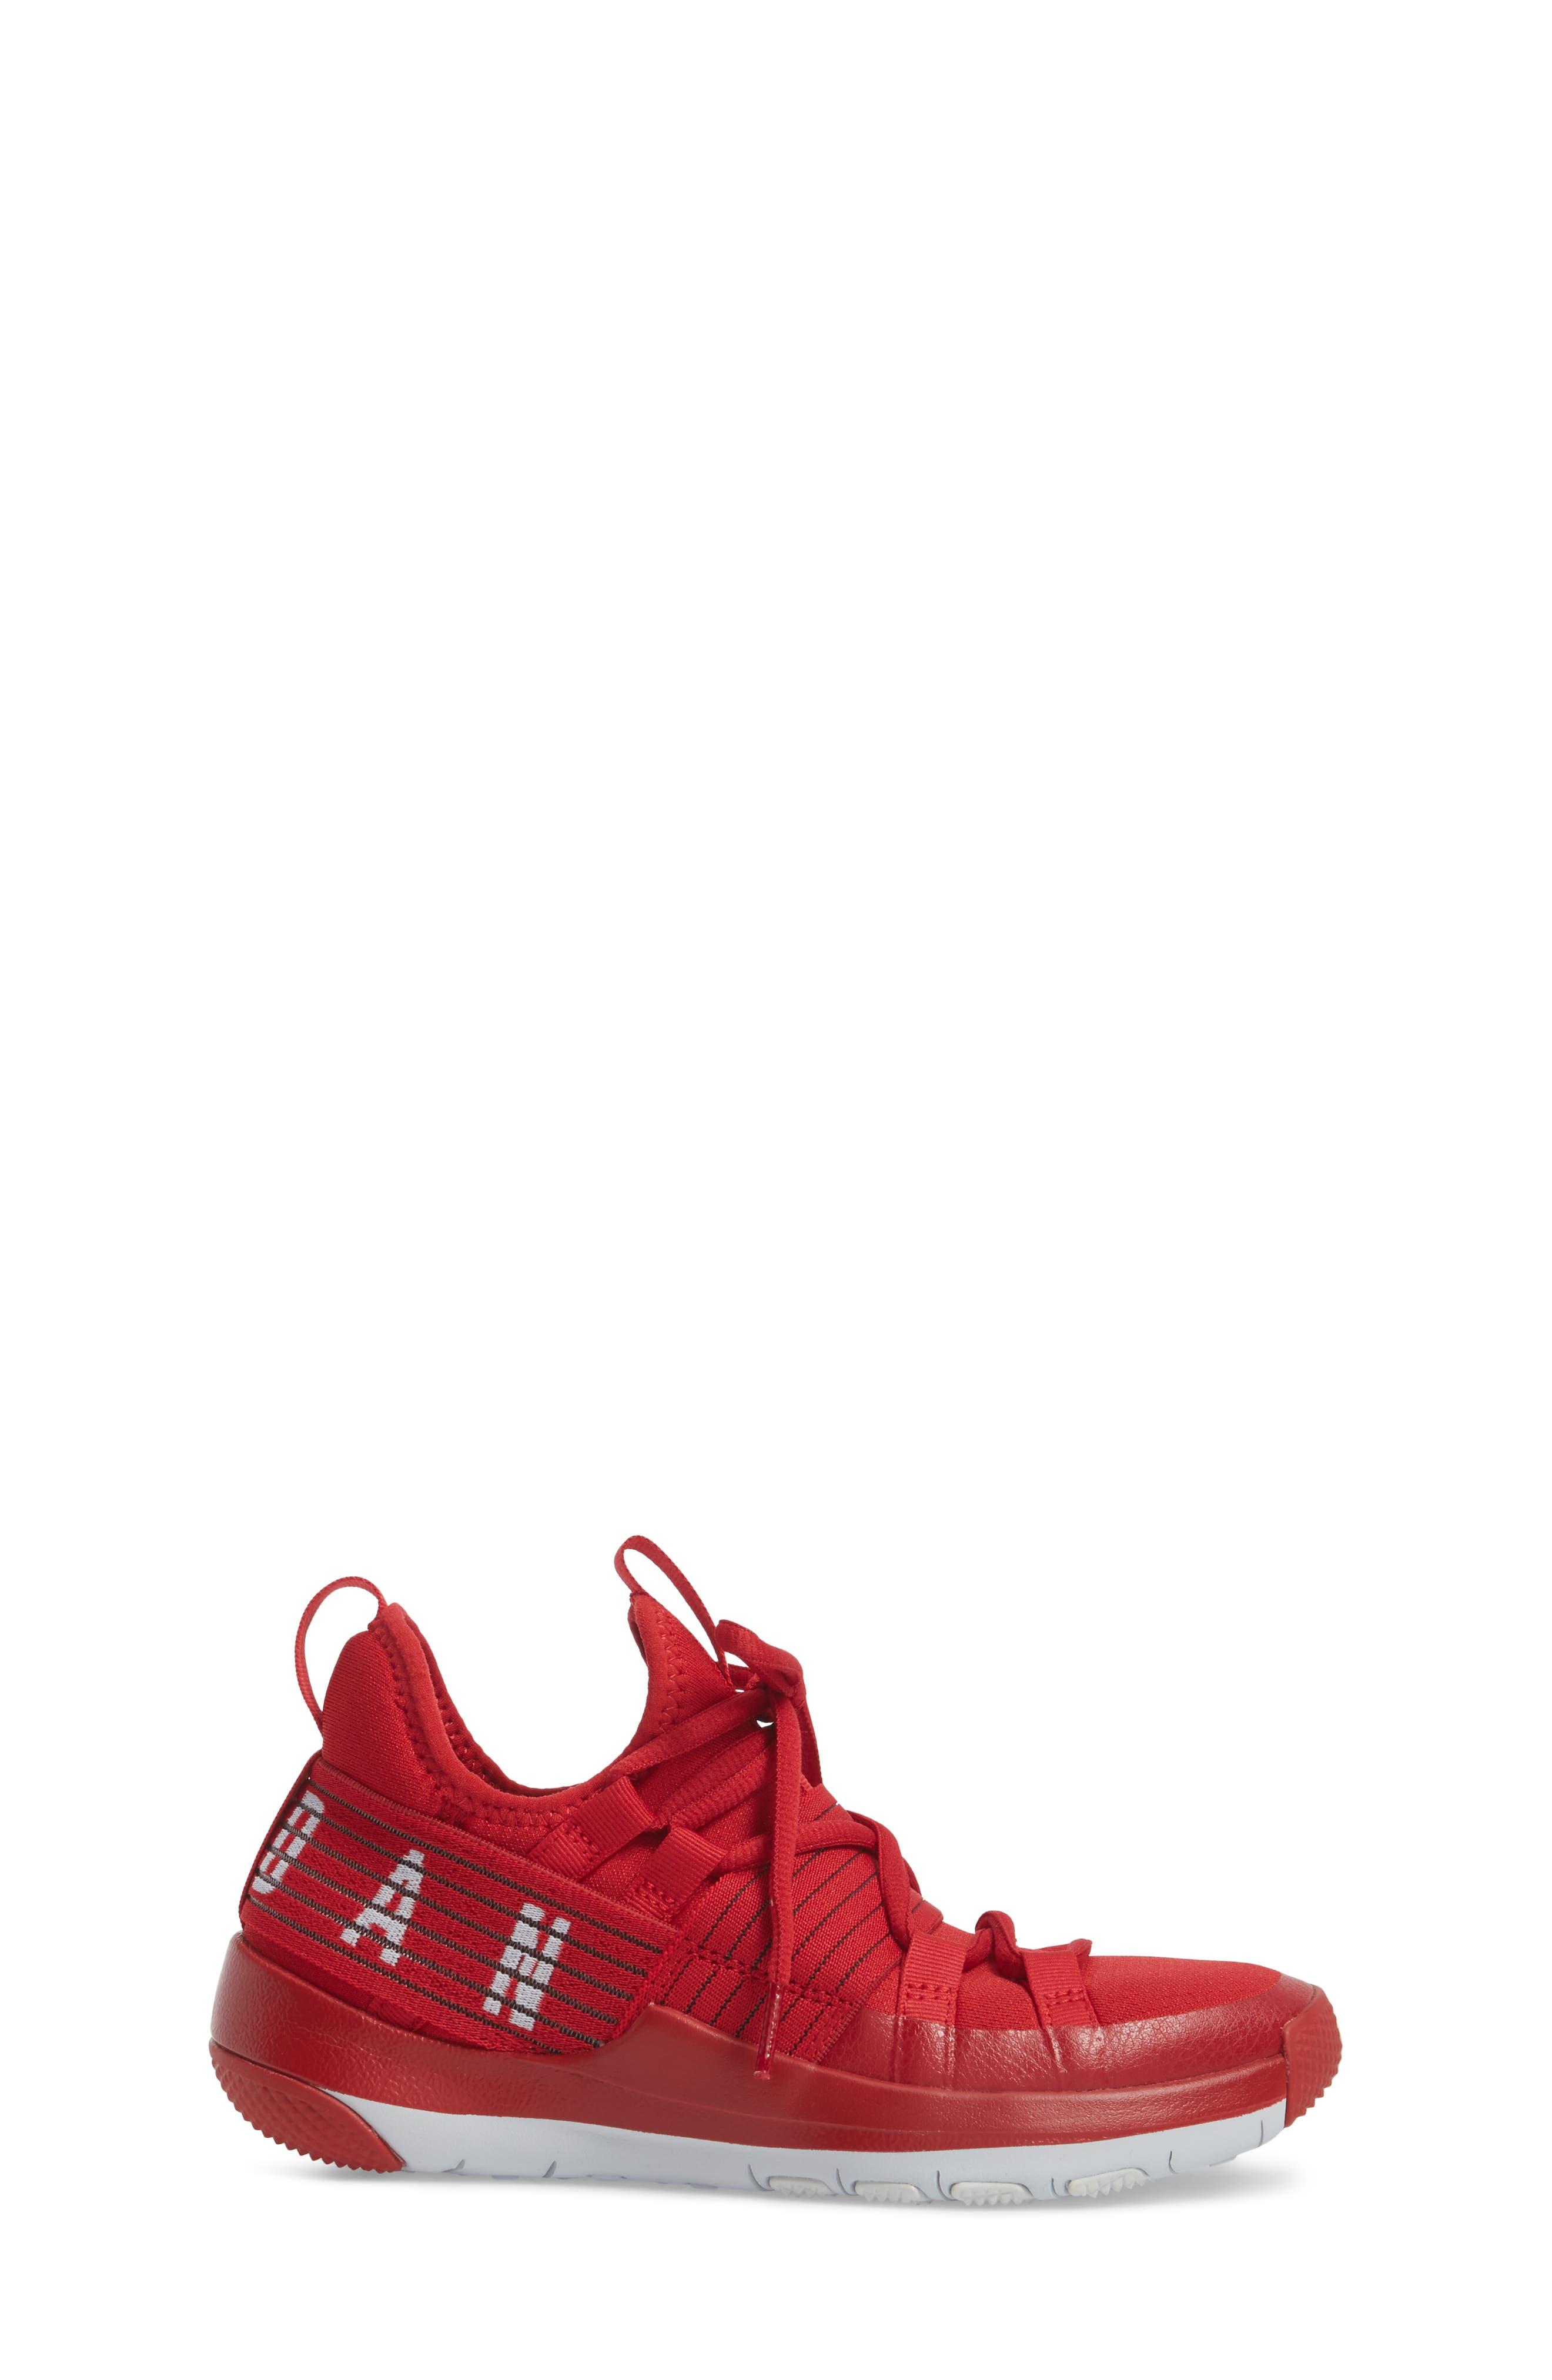 Trainer Pro Training Shoe,                             Alternate thumbnail 3, color,                             Gym Red/ Pure Platinum